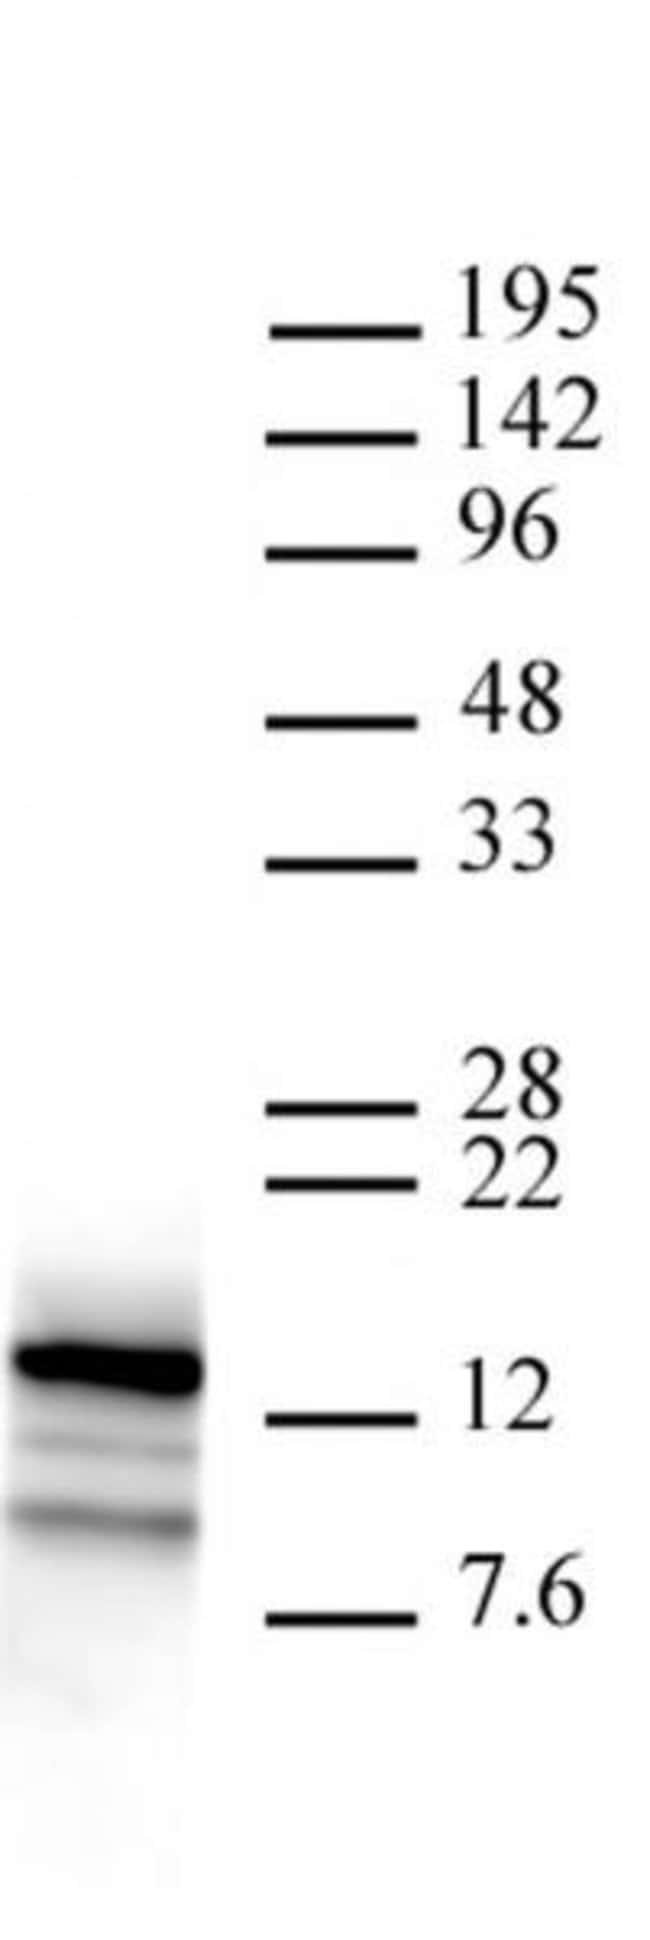 Htz1 / Histone H2A.Z Rabbit anti-Yeast, Unconjugated, Polyclonal, Active